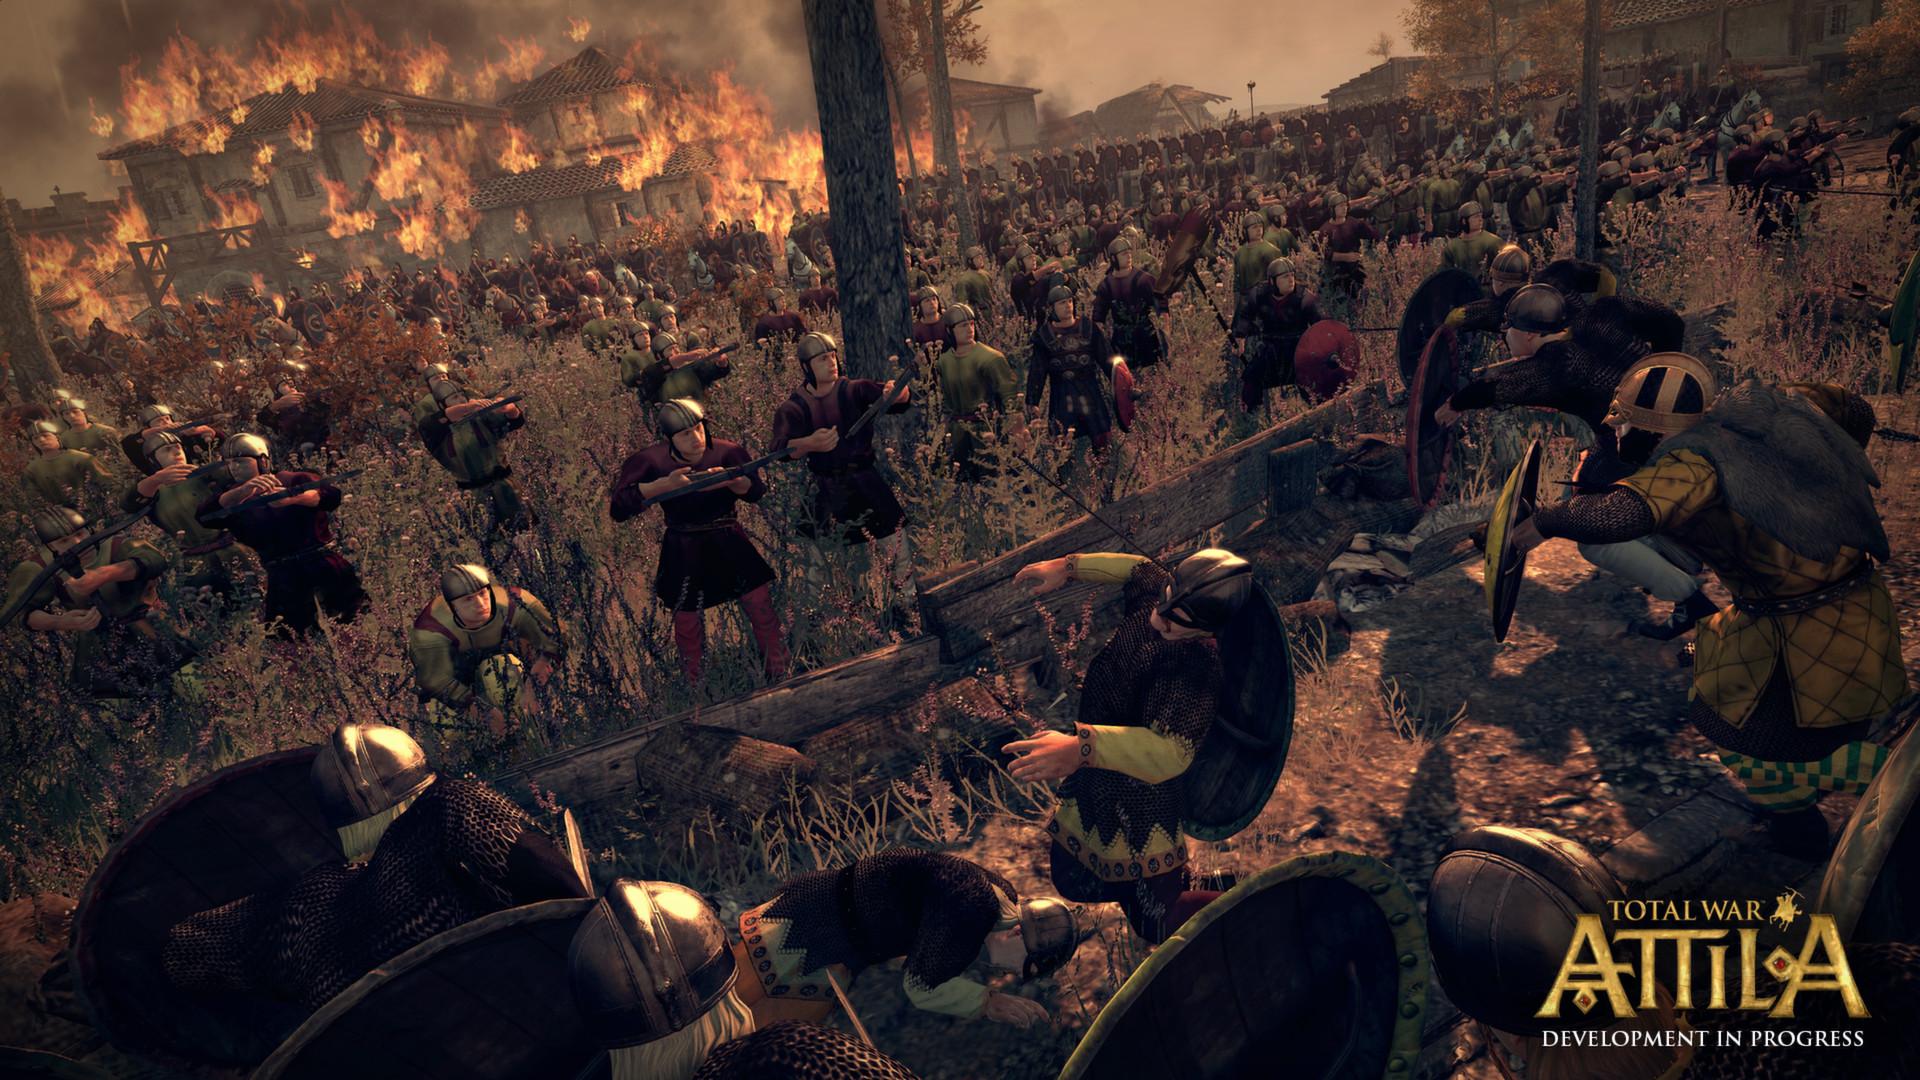 Total War Attila ESPAÑOL Full PC Incluye DLC (CPY) + REPACK 2 DVD5 (JPW) 9